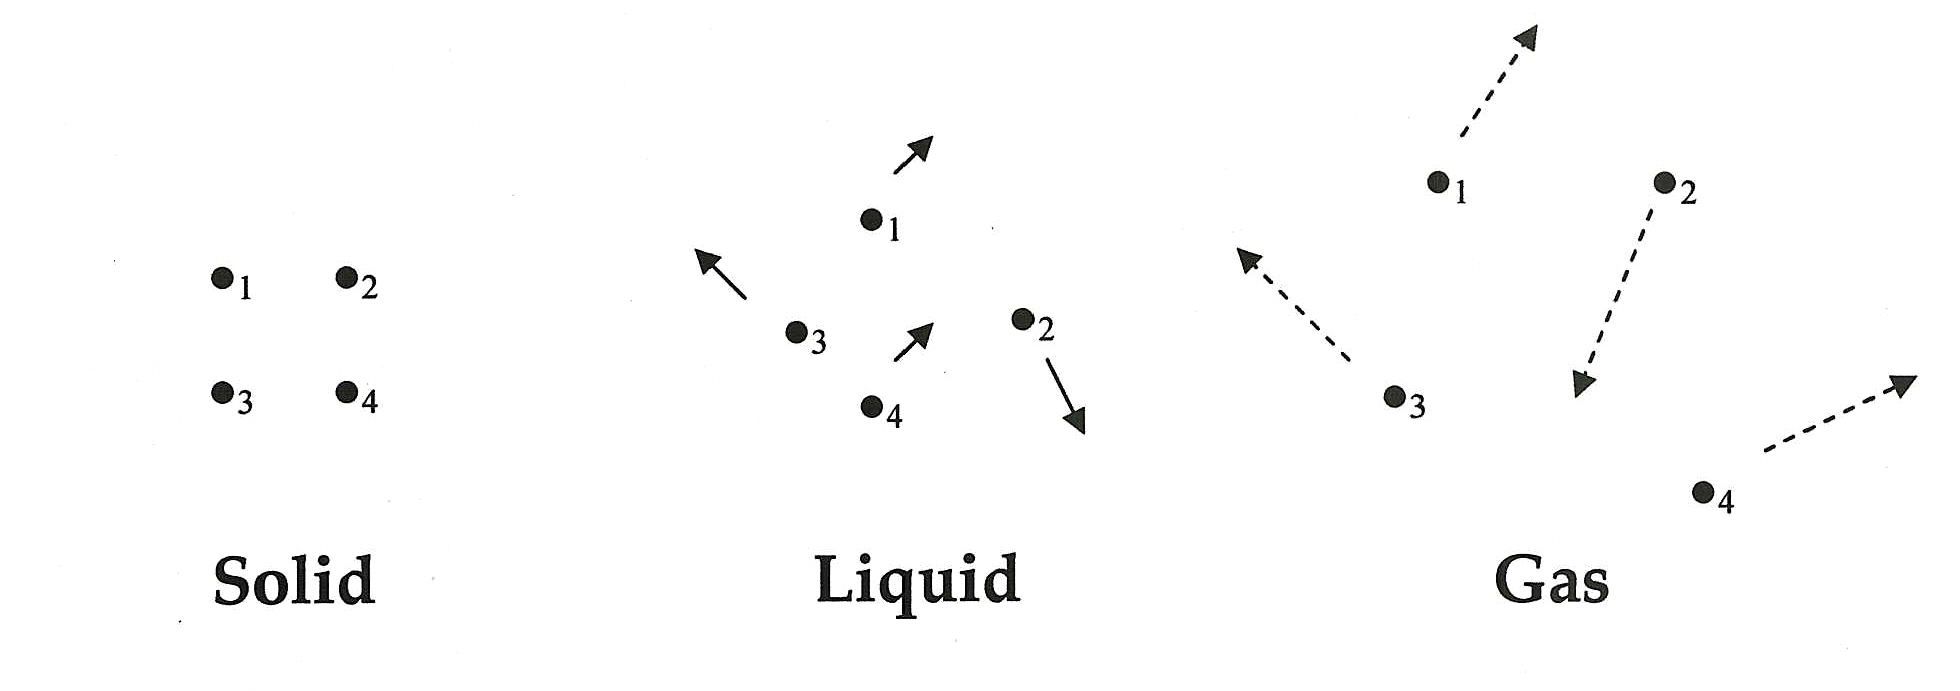 File Solid-liquid-gas jpgSolid Liquid Gas